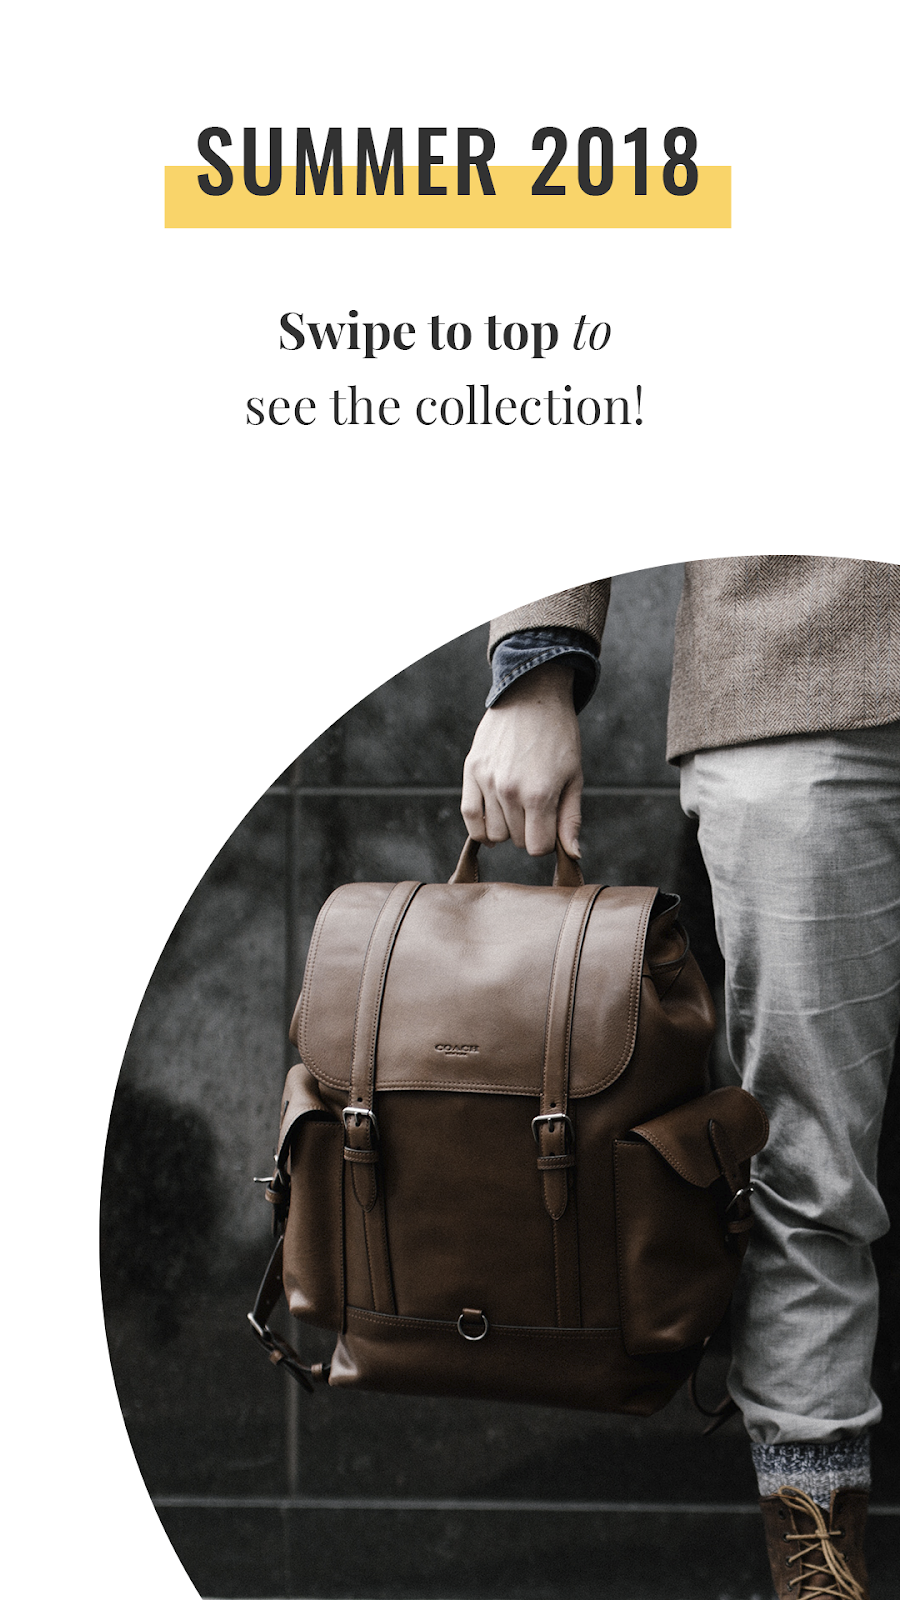 Designest Product Advertisement 2 Instagram Stories Template